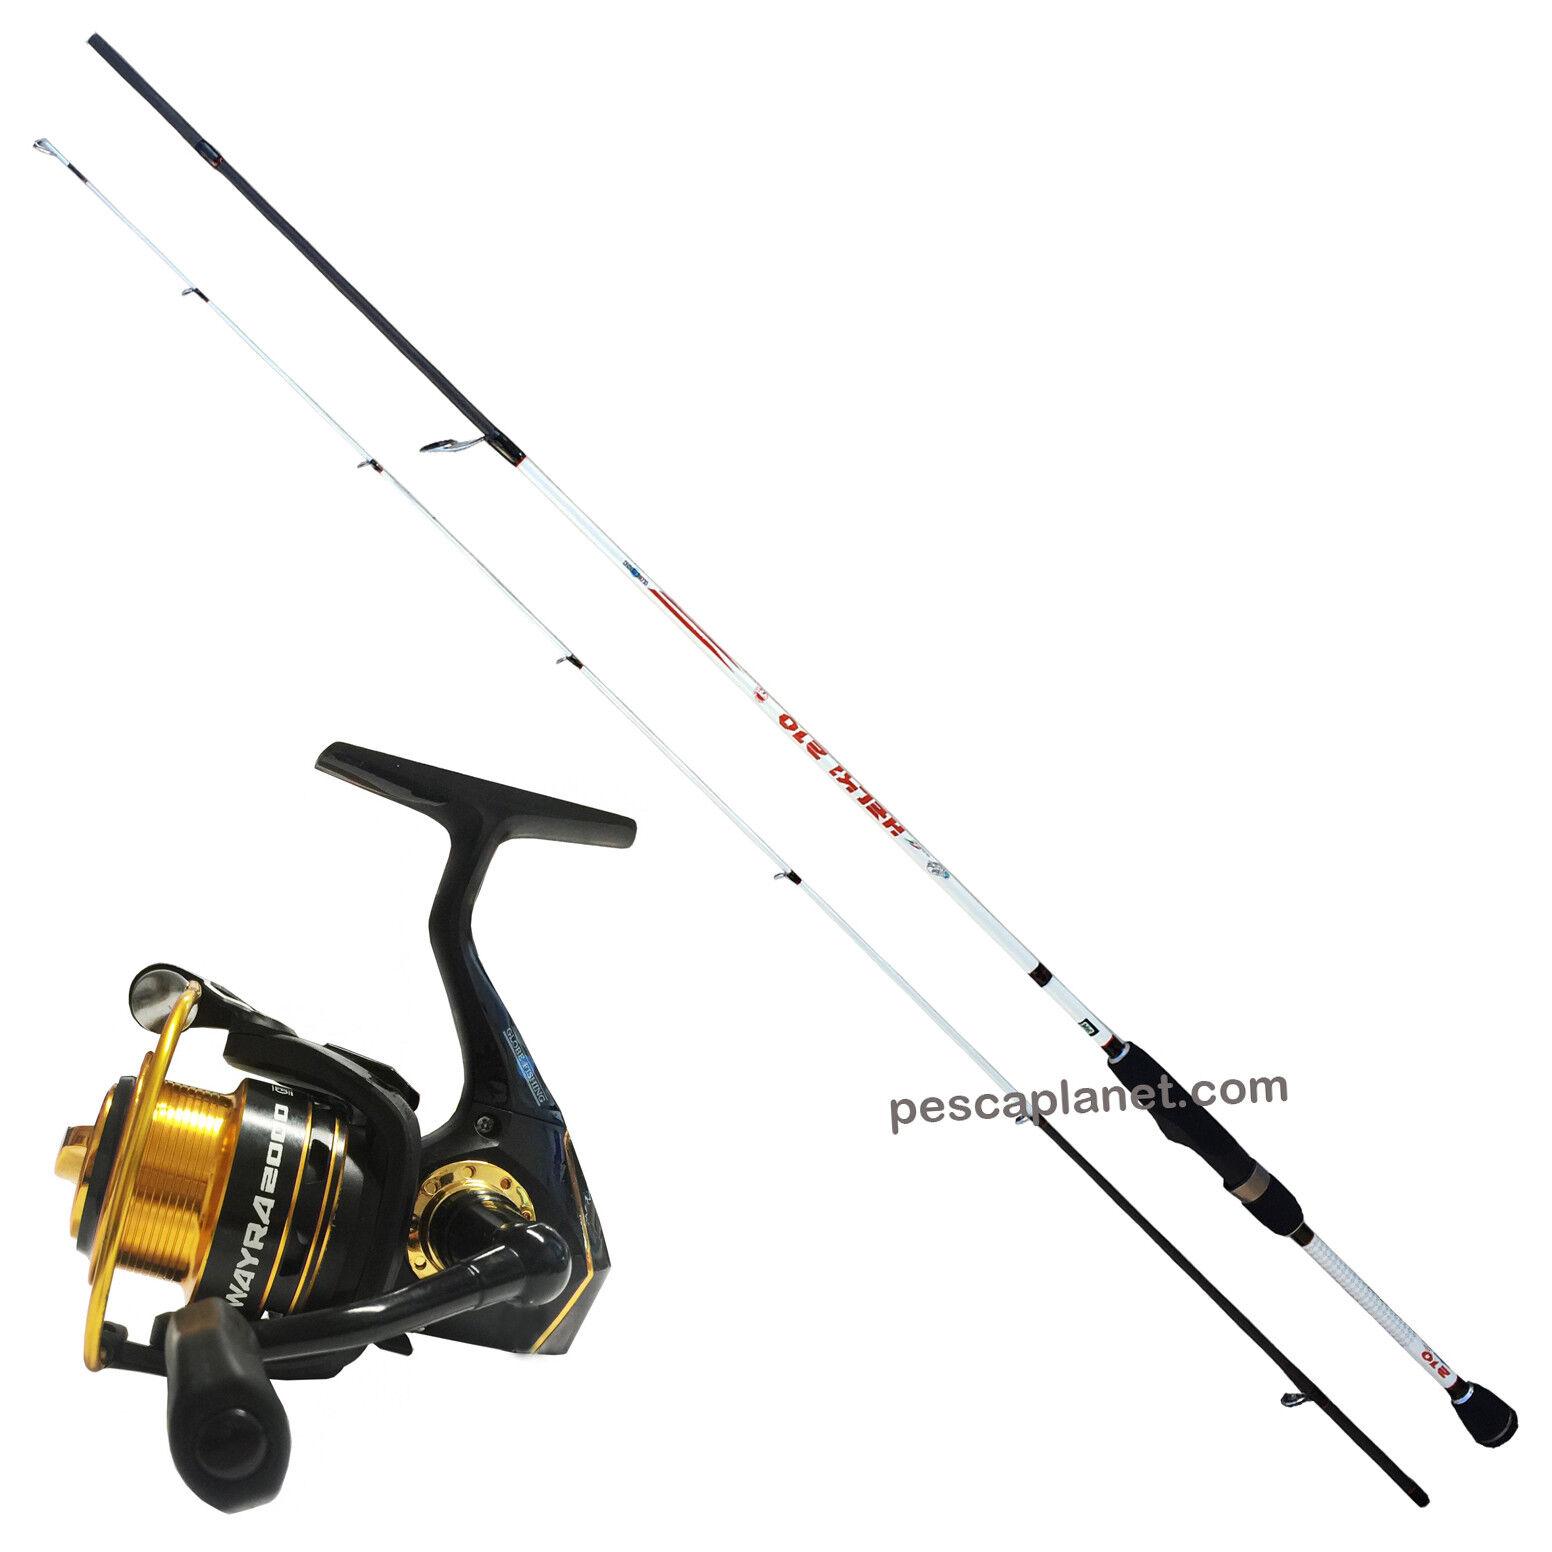 KP3550 Kit Pesca Trout Area Globe Fishing Canna Helki 1,90 m + Mulinello Wa CAS